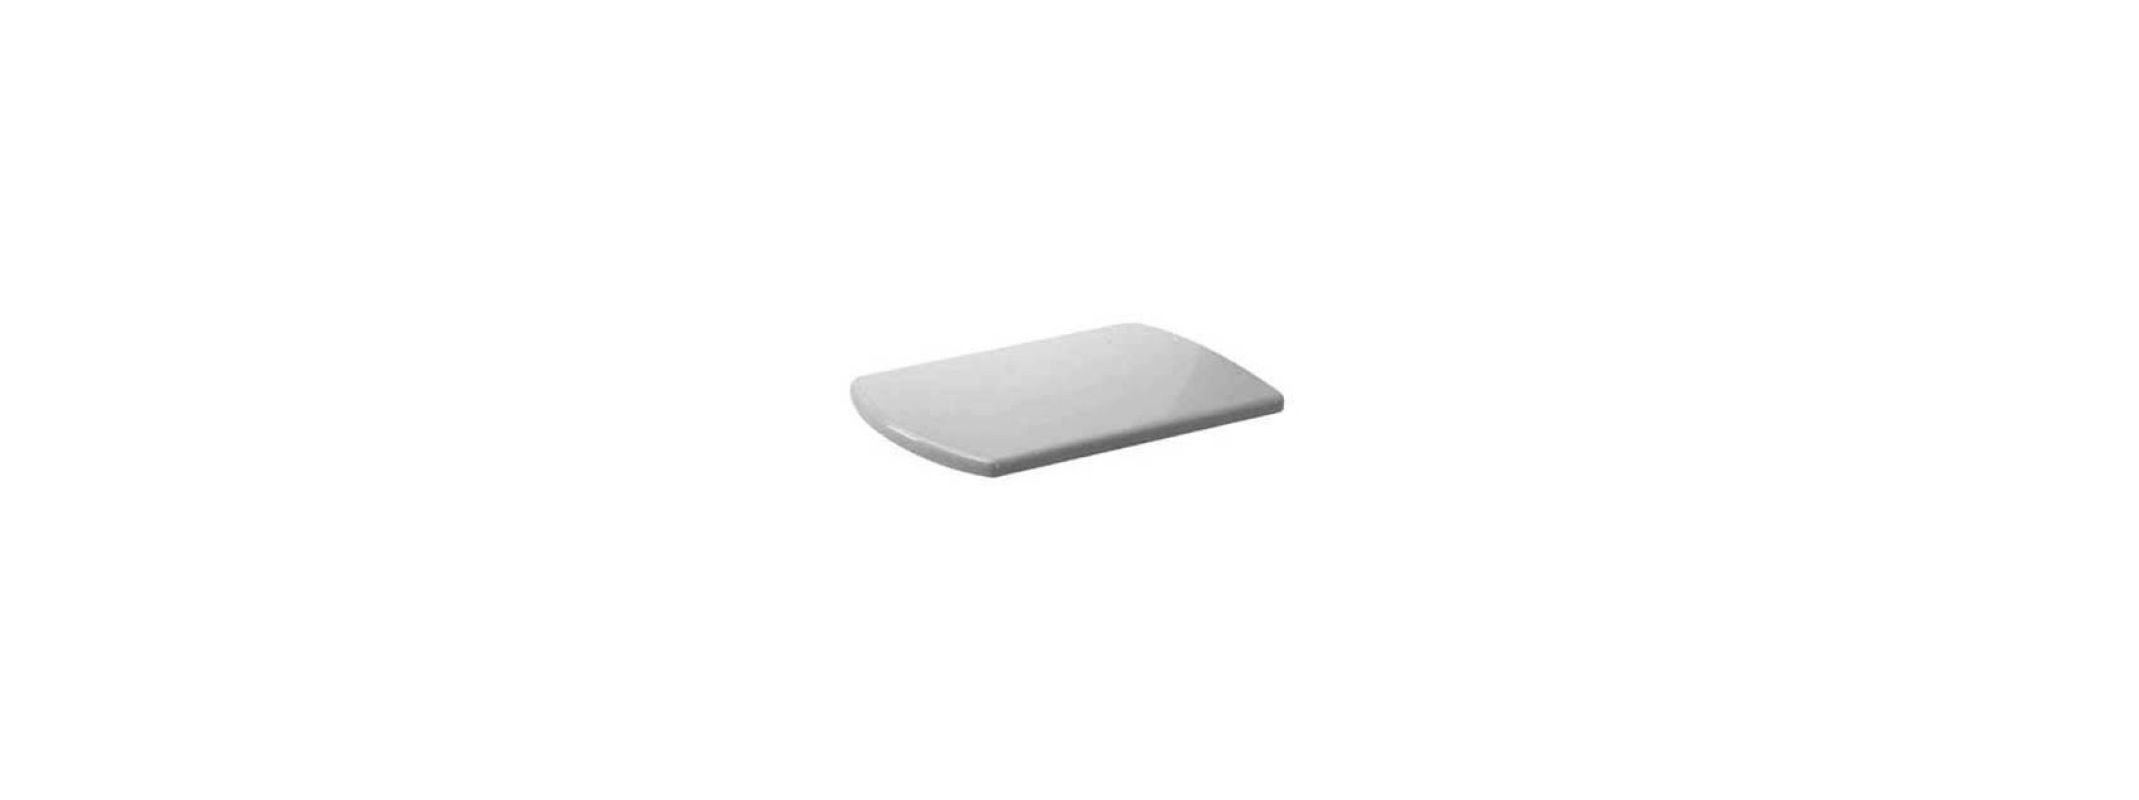 Stupendous Duravit 0065610000 Caro Rectangular Toilet Seat White Ibusinesslaw Wood Chair Design Ideas Ibusinesslaworg